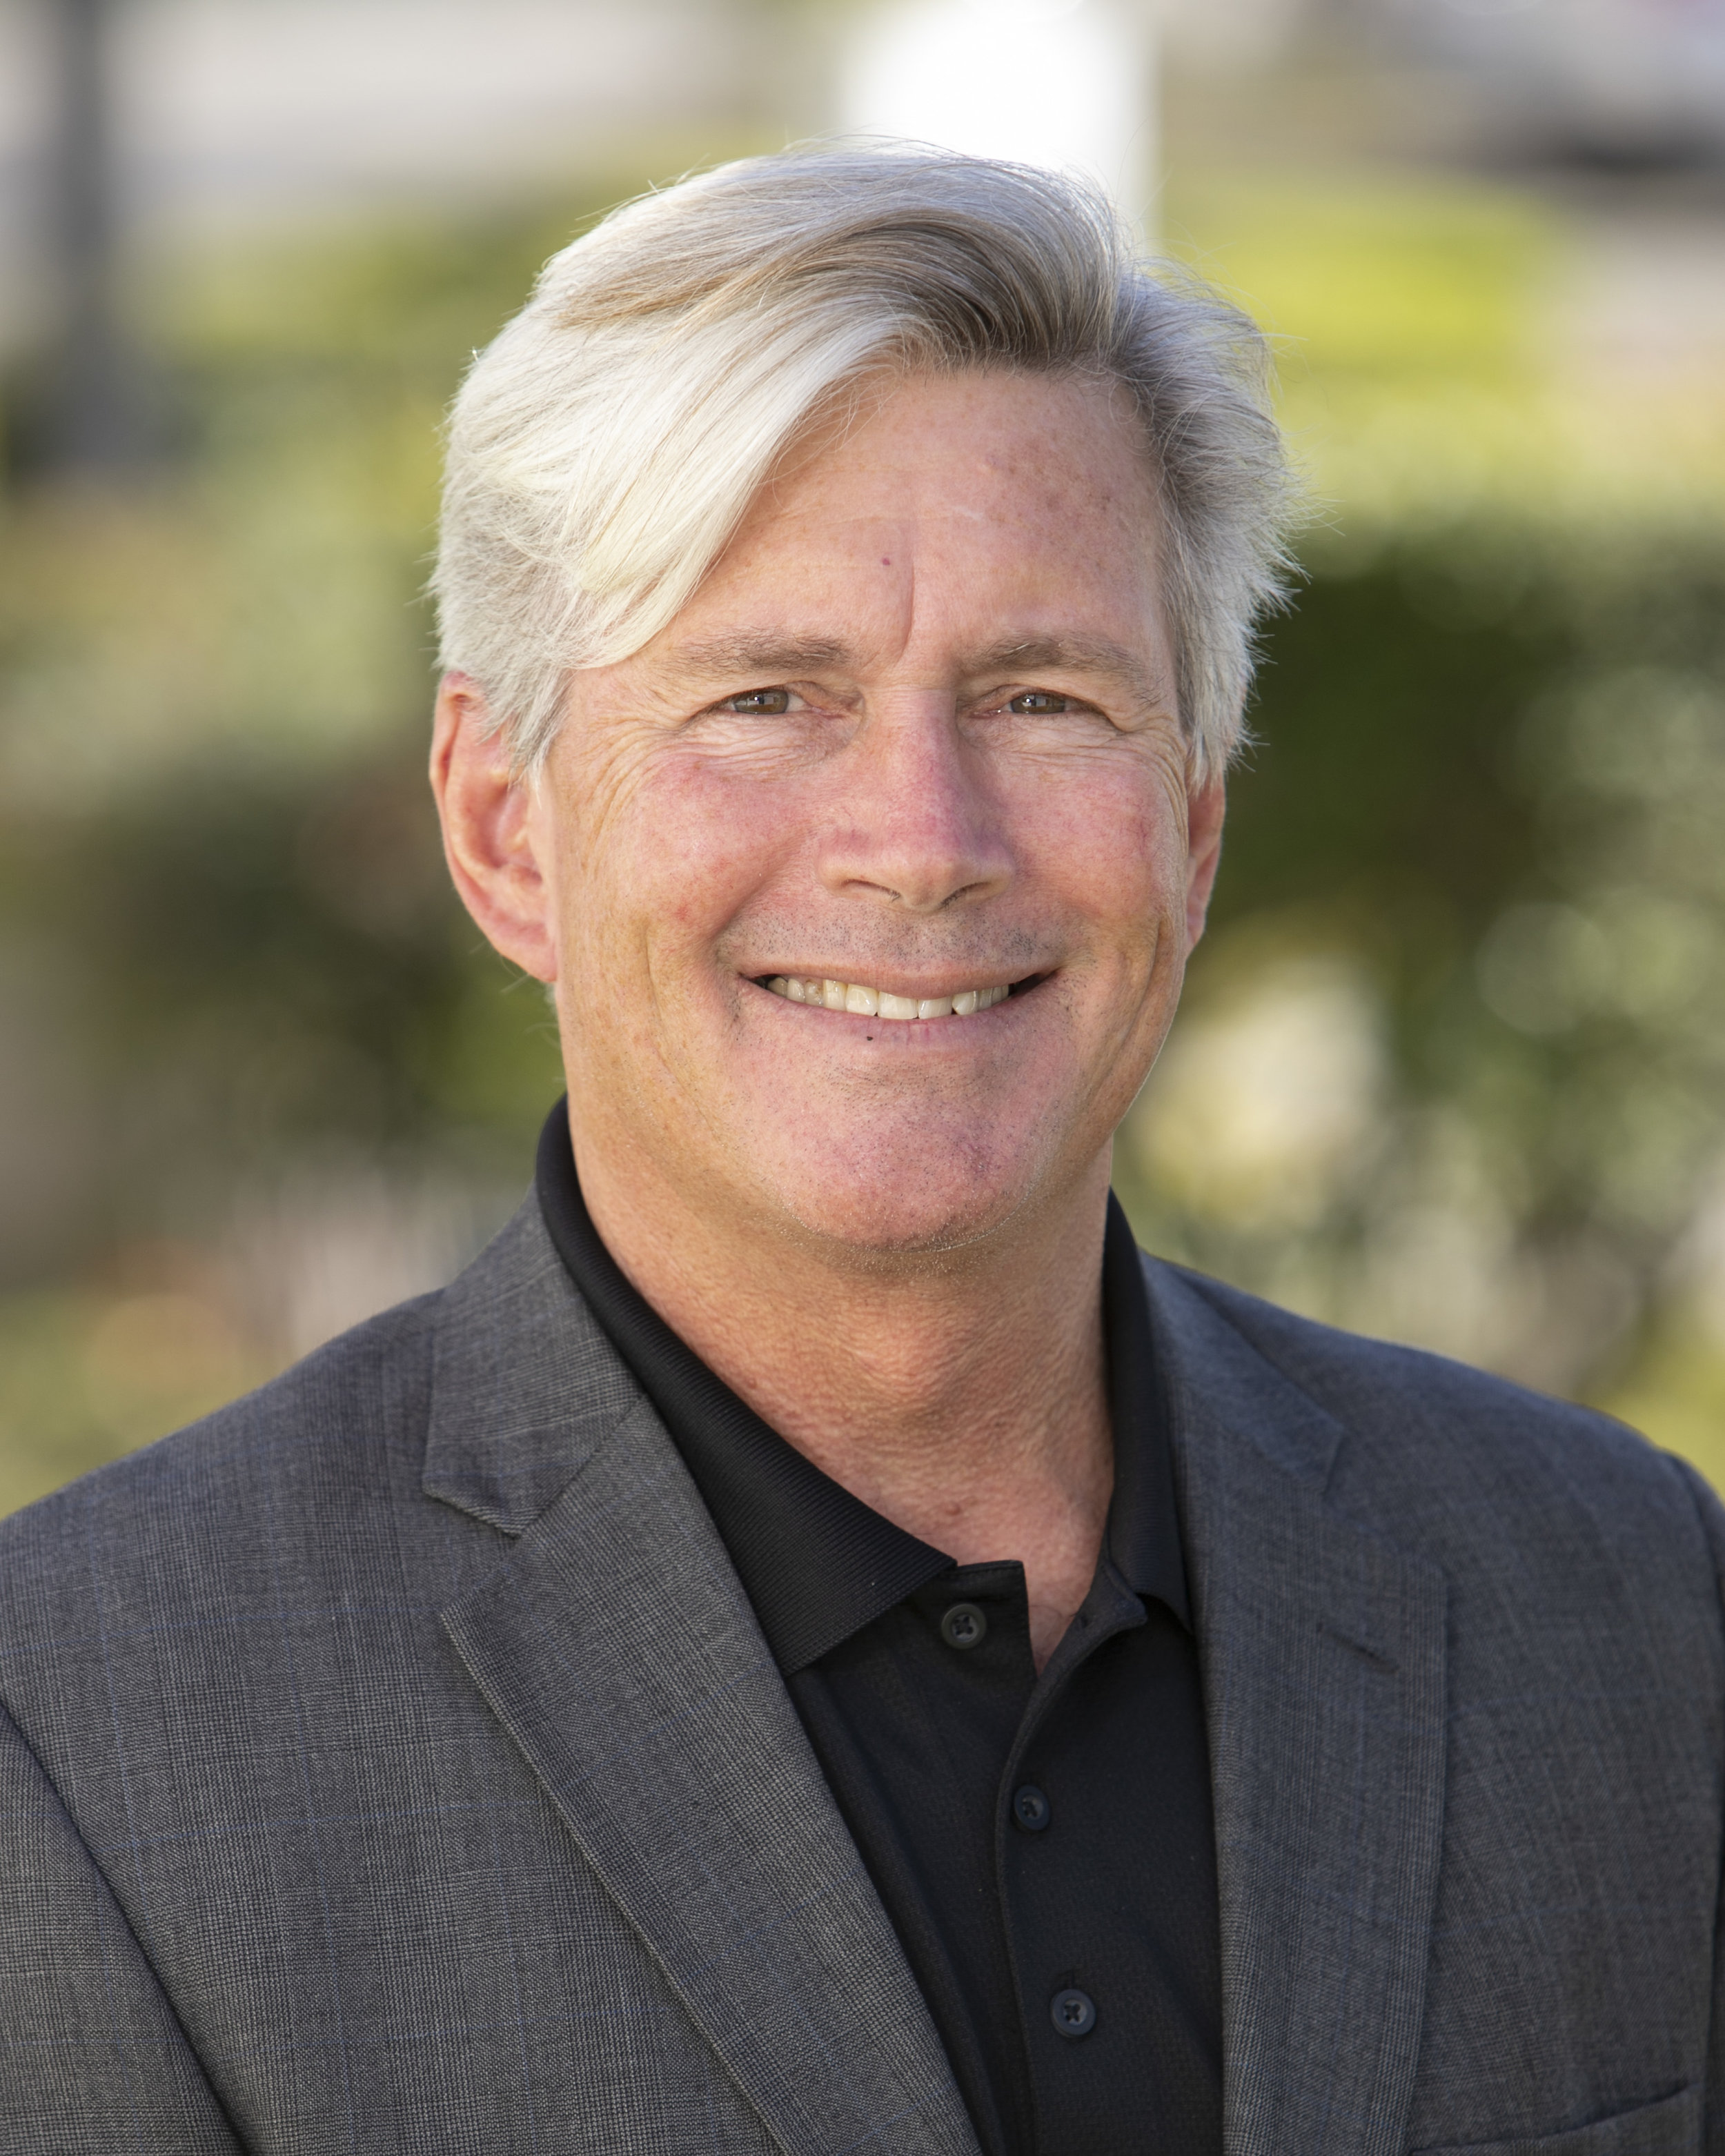 Scott Tiedge